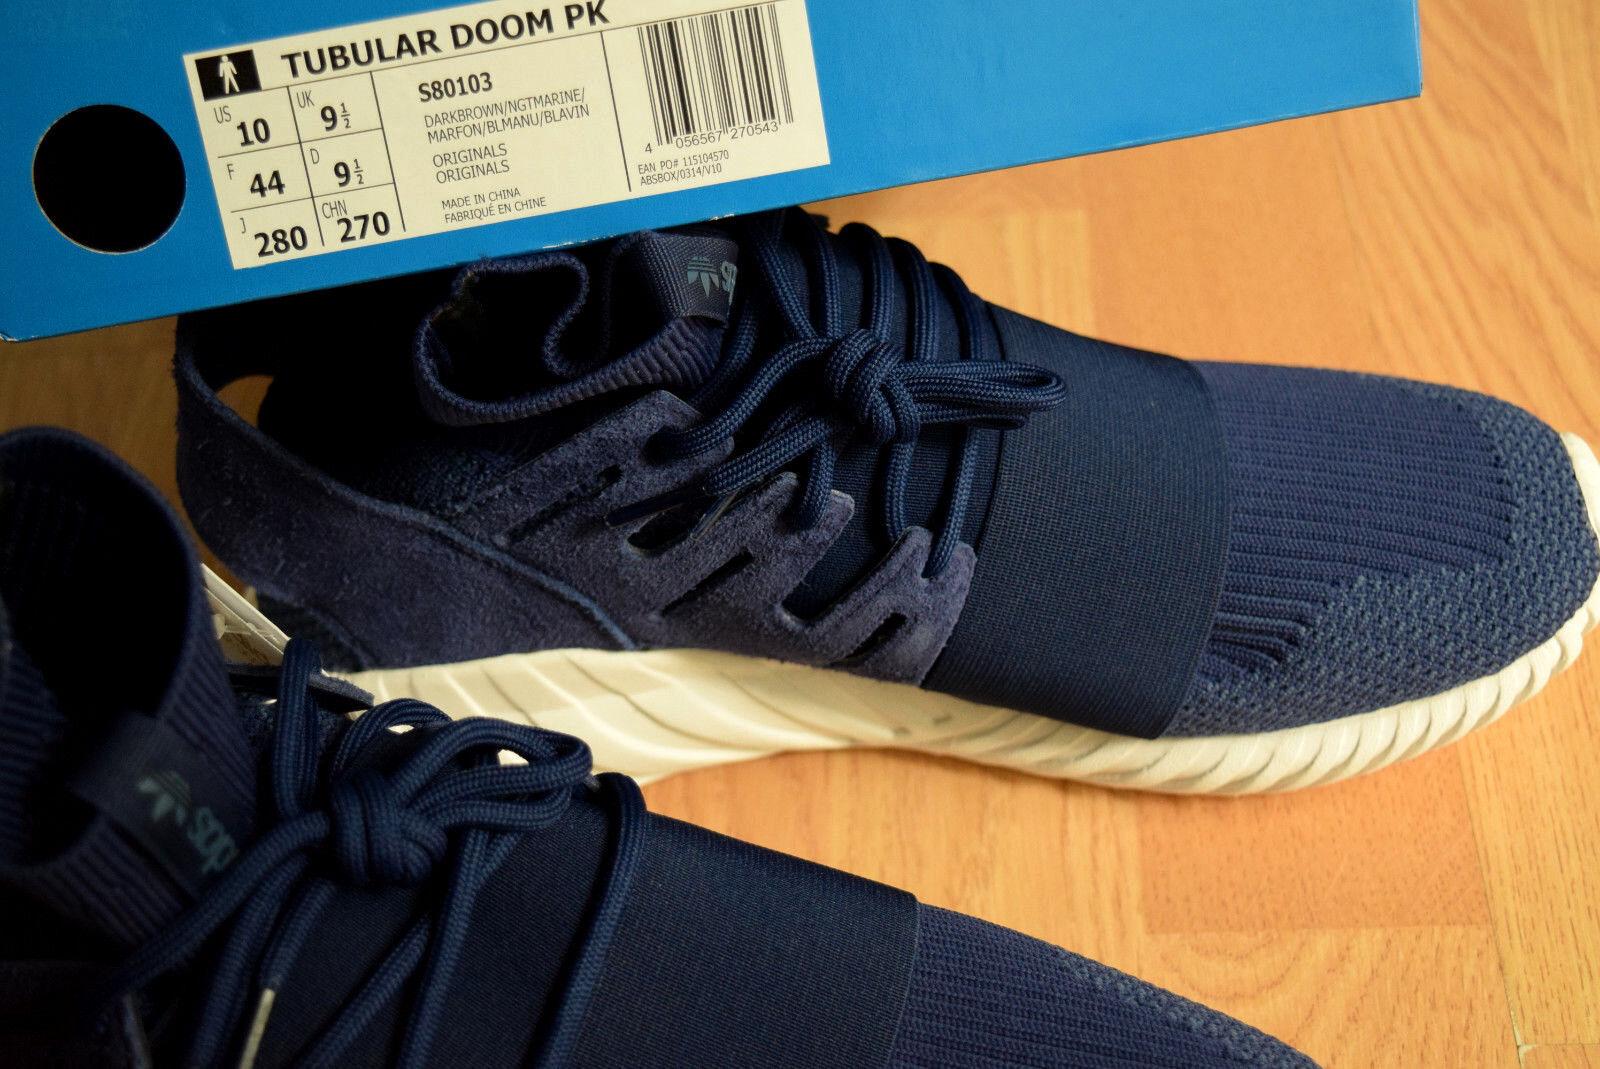 Adidas Tubular Doom PK 41 42 44 47 46 47 44  S80103 shadow viral radial yeezy runner 6a972d